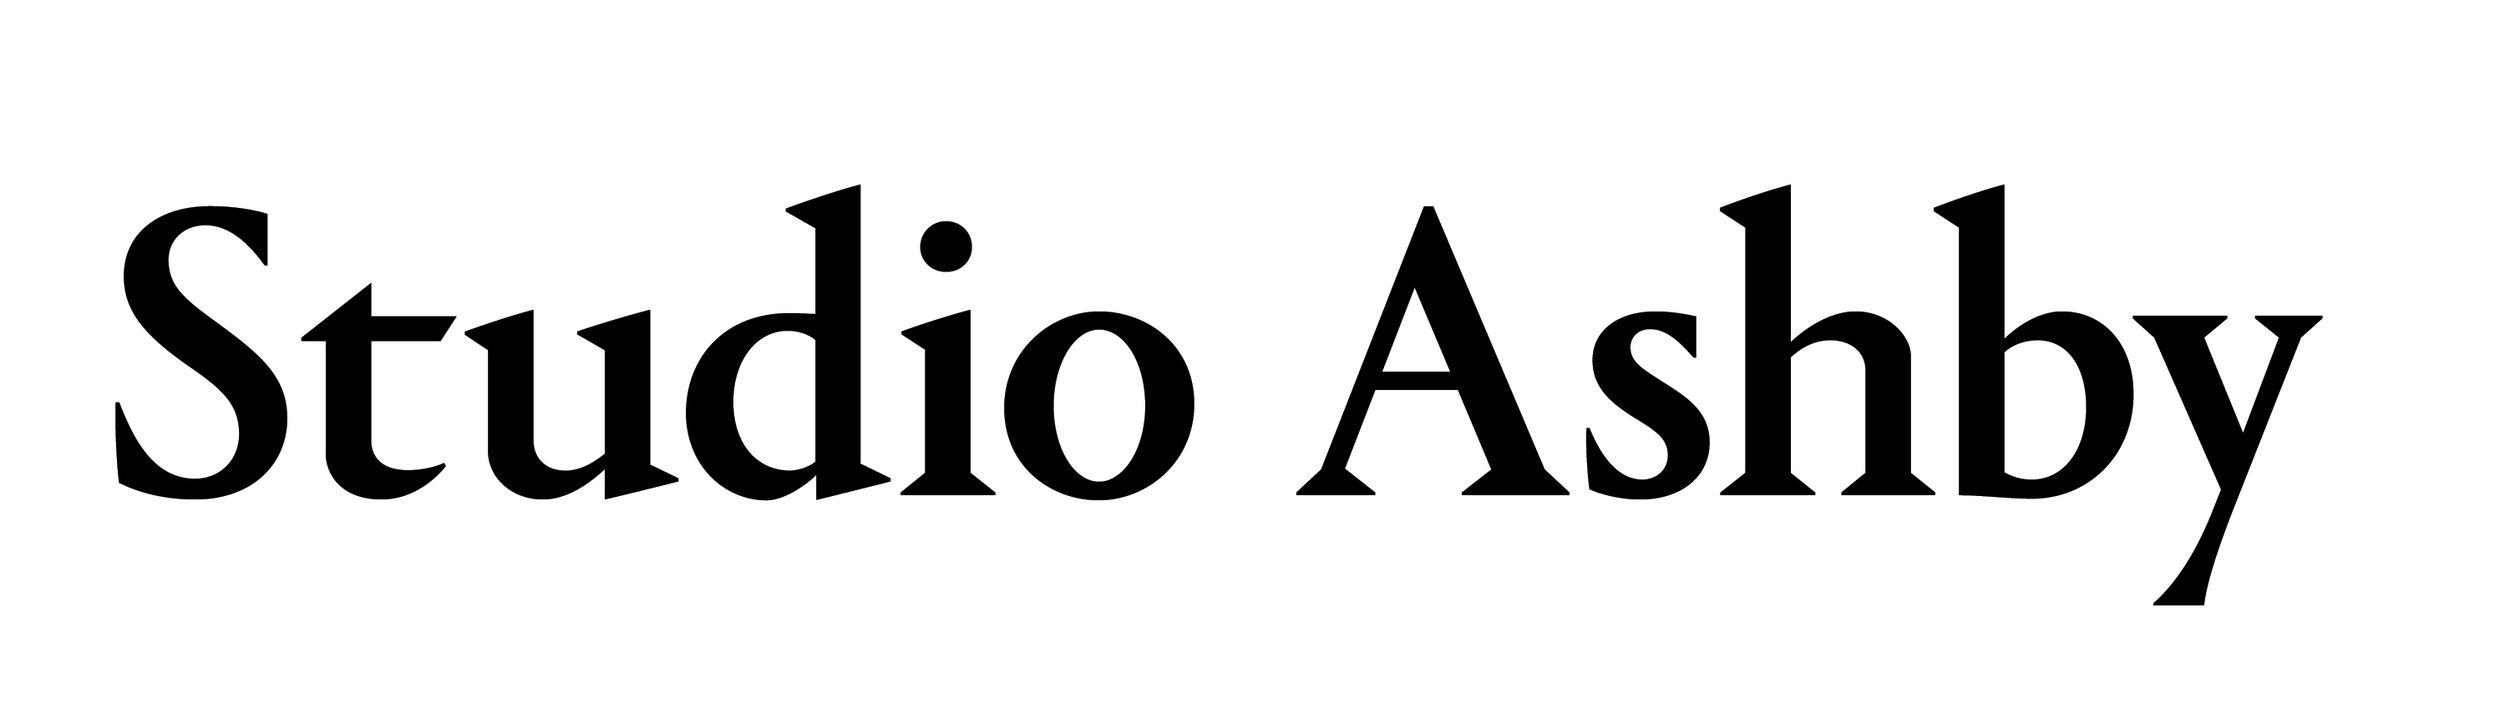 STUDIO ASHBY FOCUS BLACK.jpg